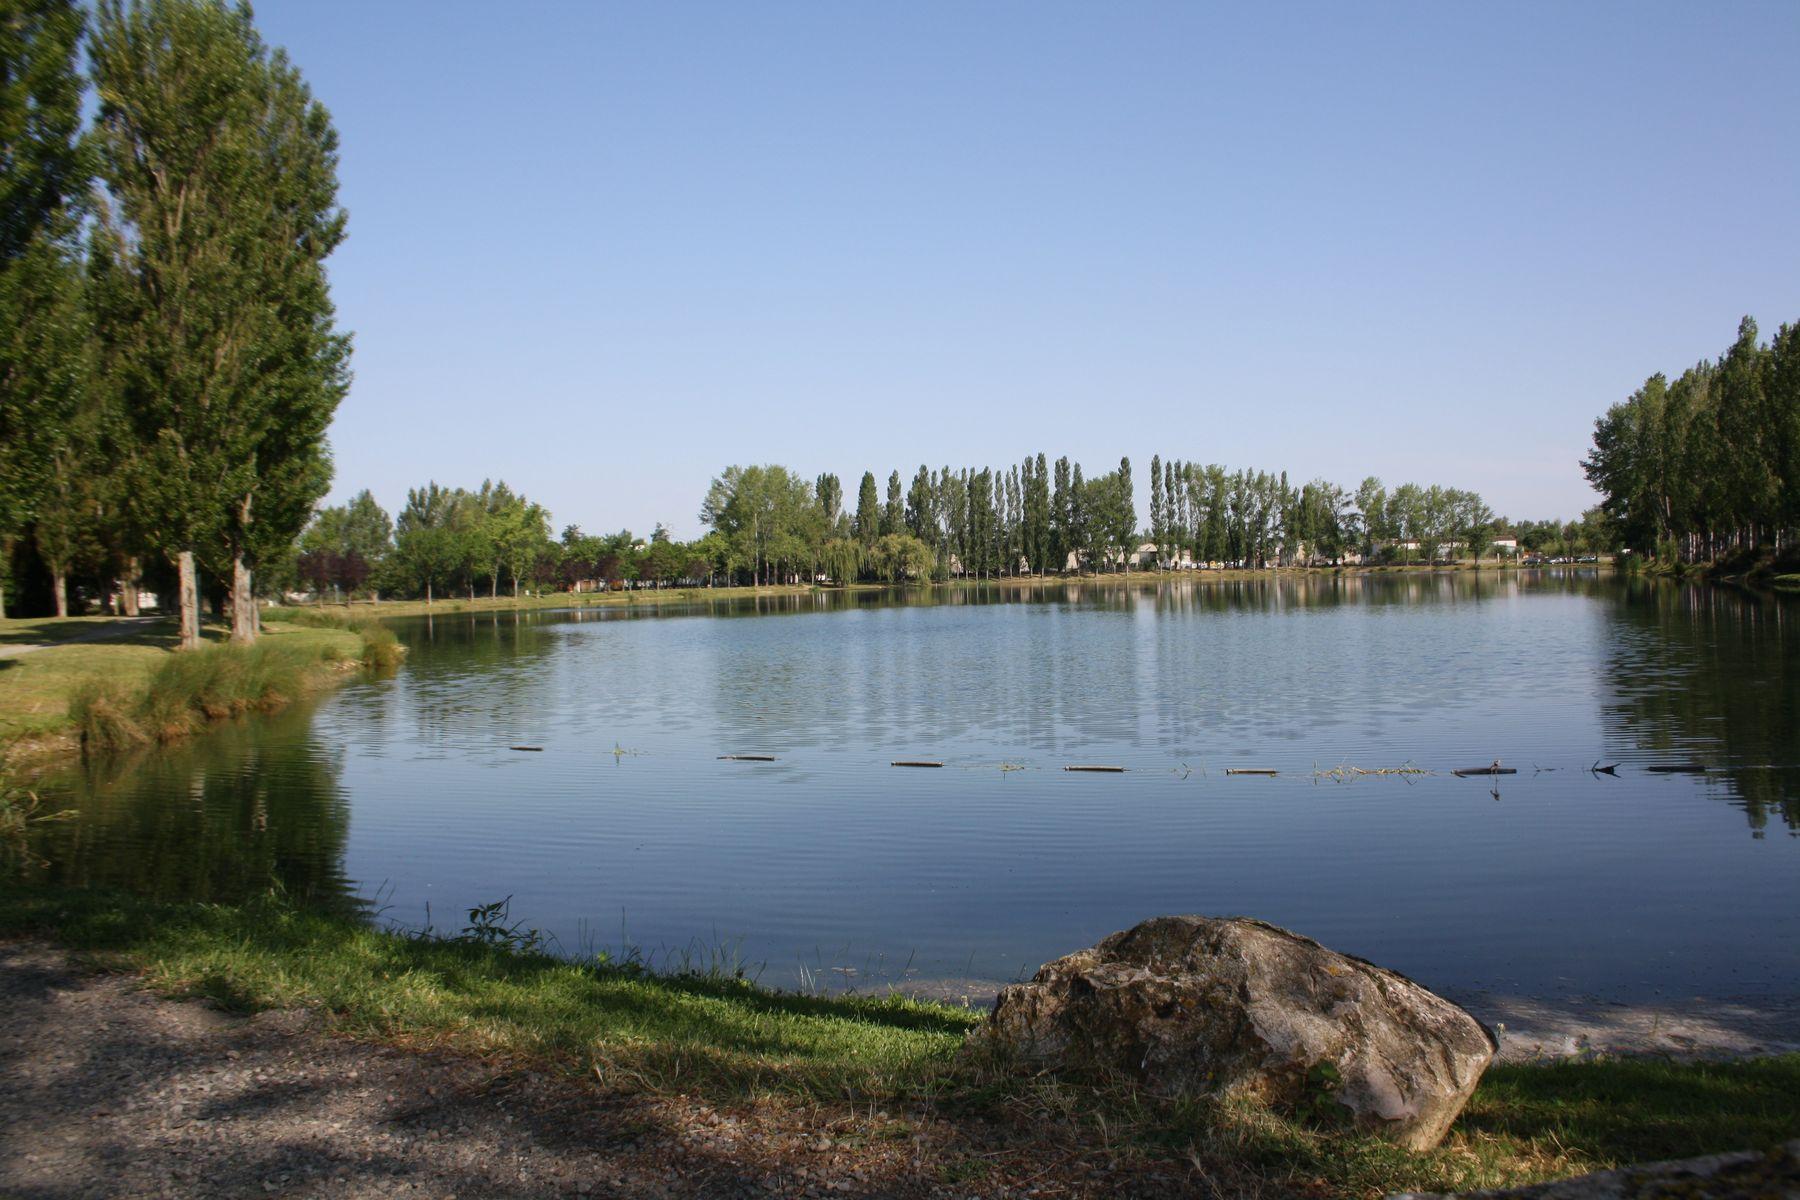 Espaces verts et espaces naturels aucamville for Claude robillard piscine horaire